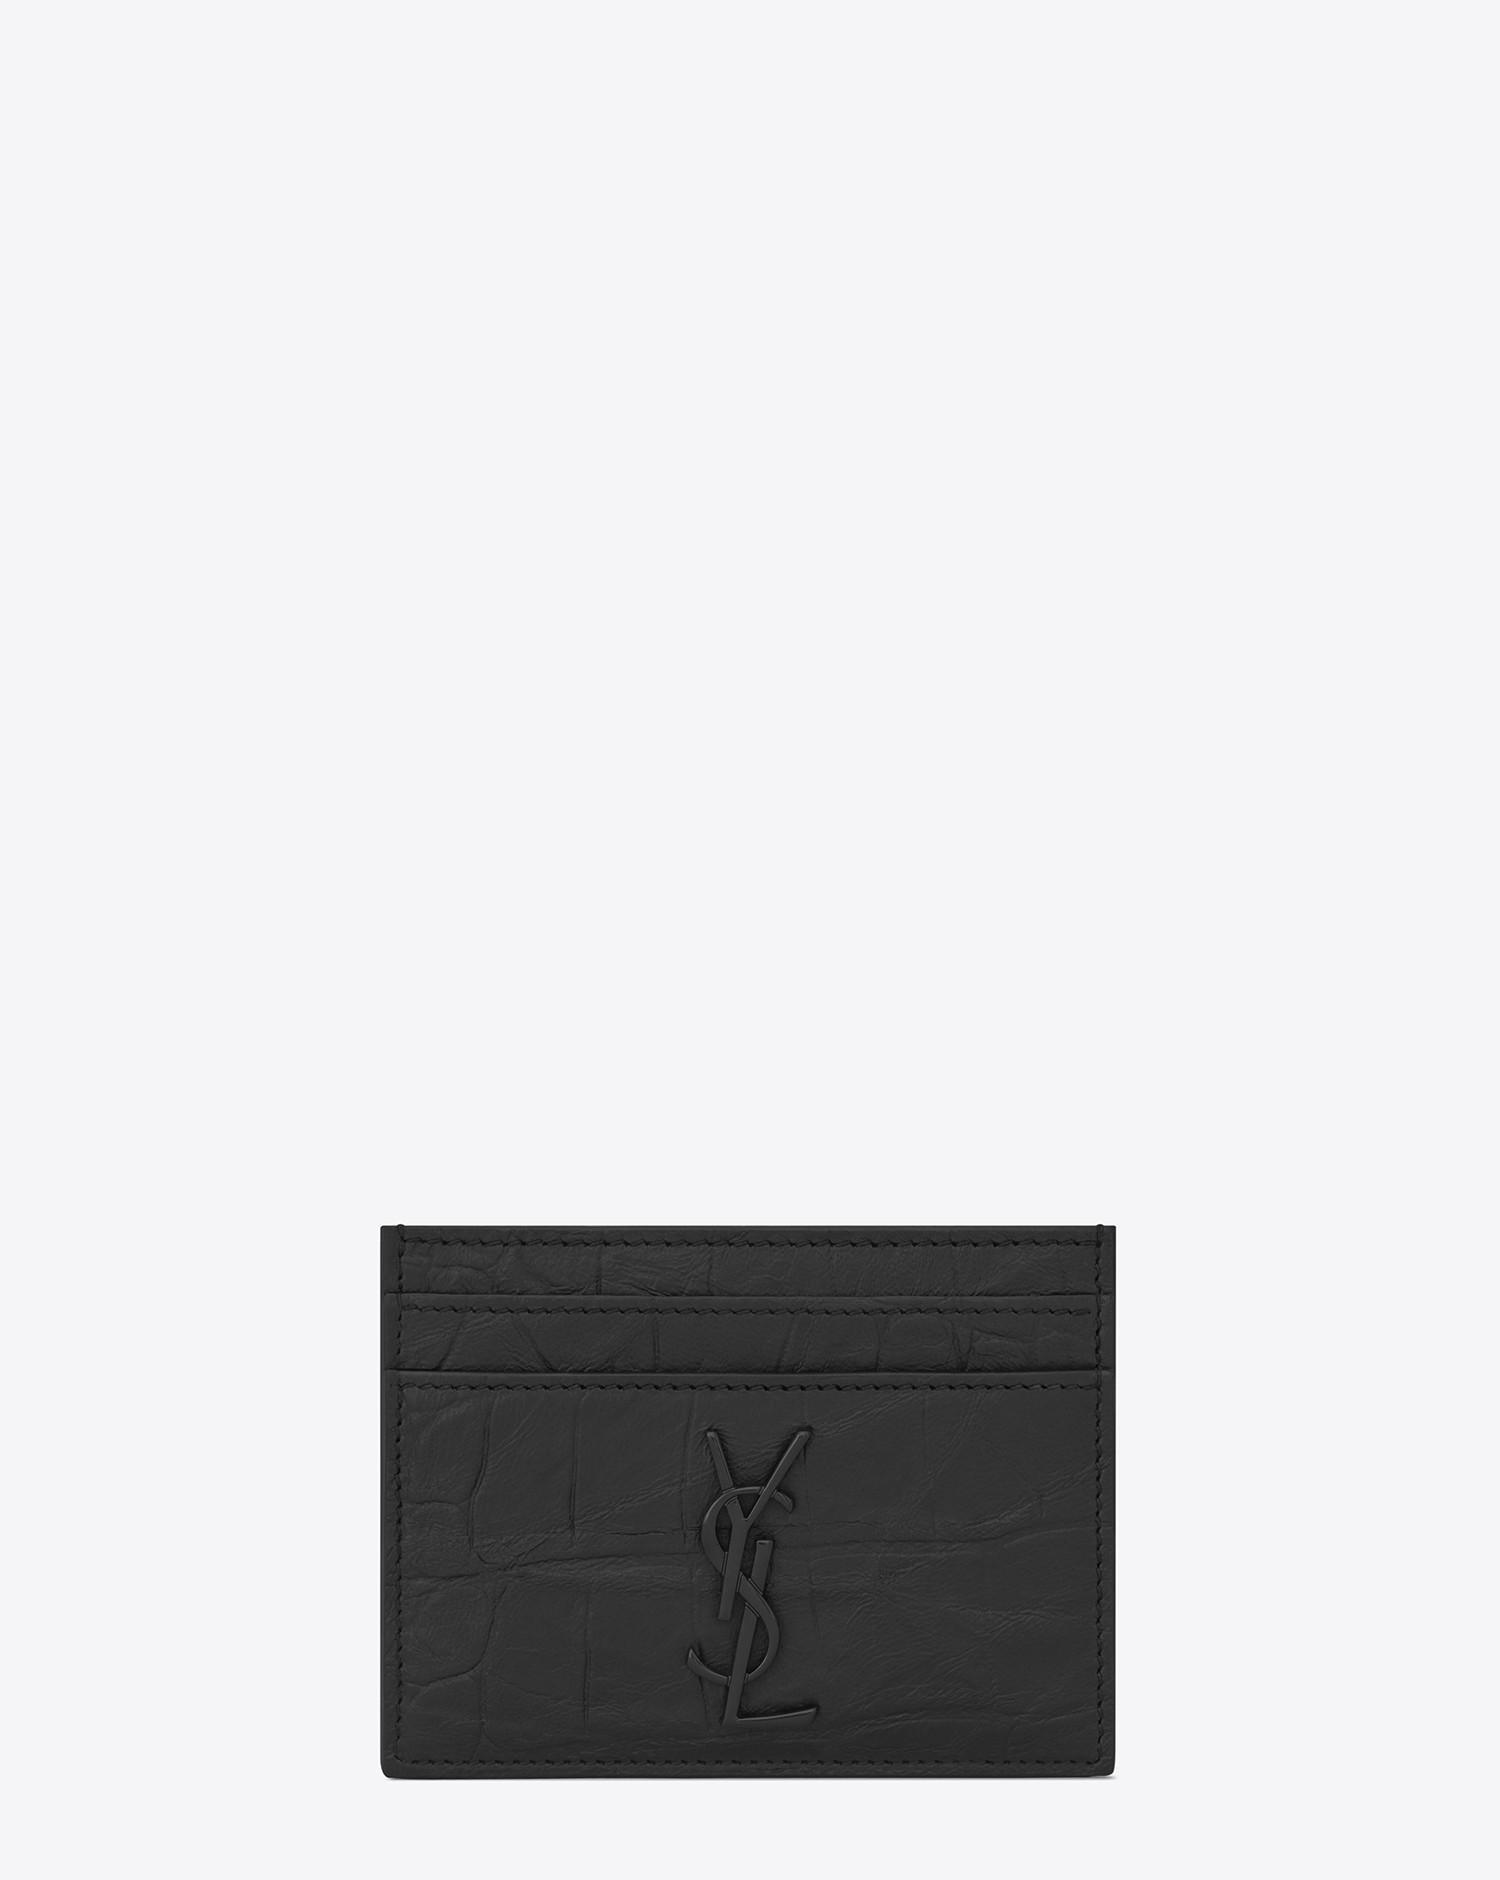 saint laurent mens black monogram card case - Monogram Card Holder